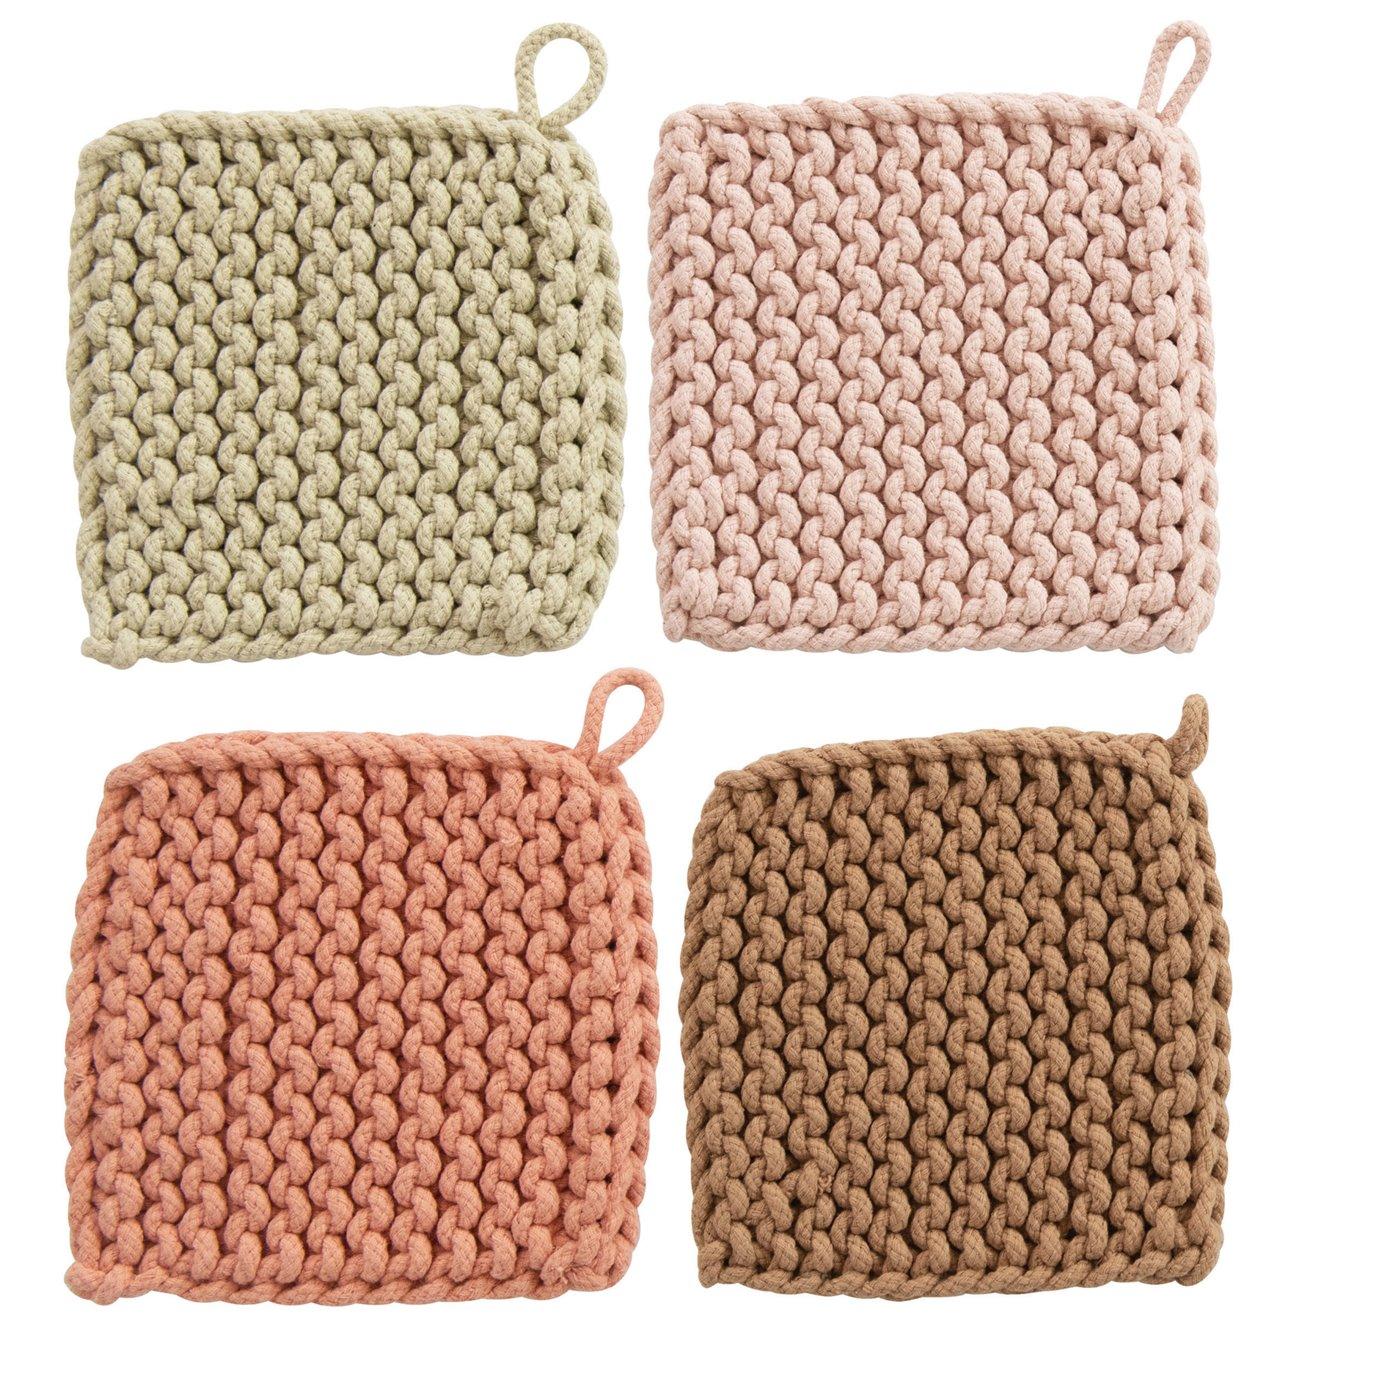 Square Cotton Crocheted Potholder, 4 Colors